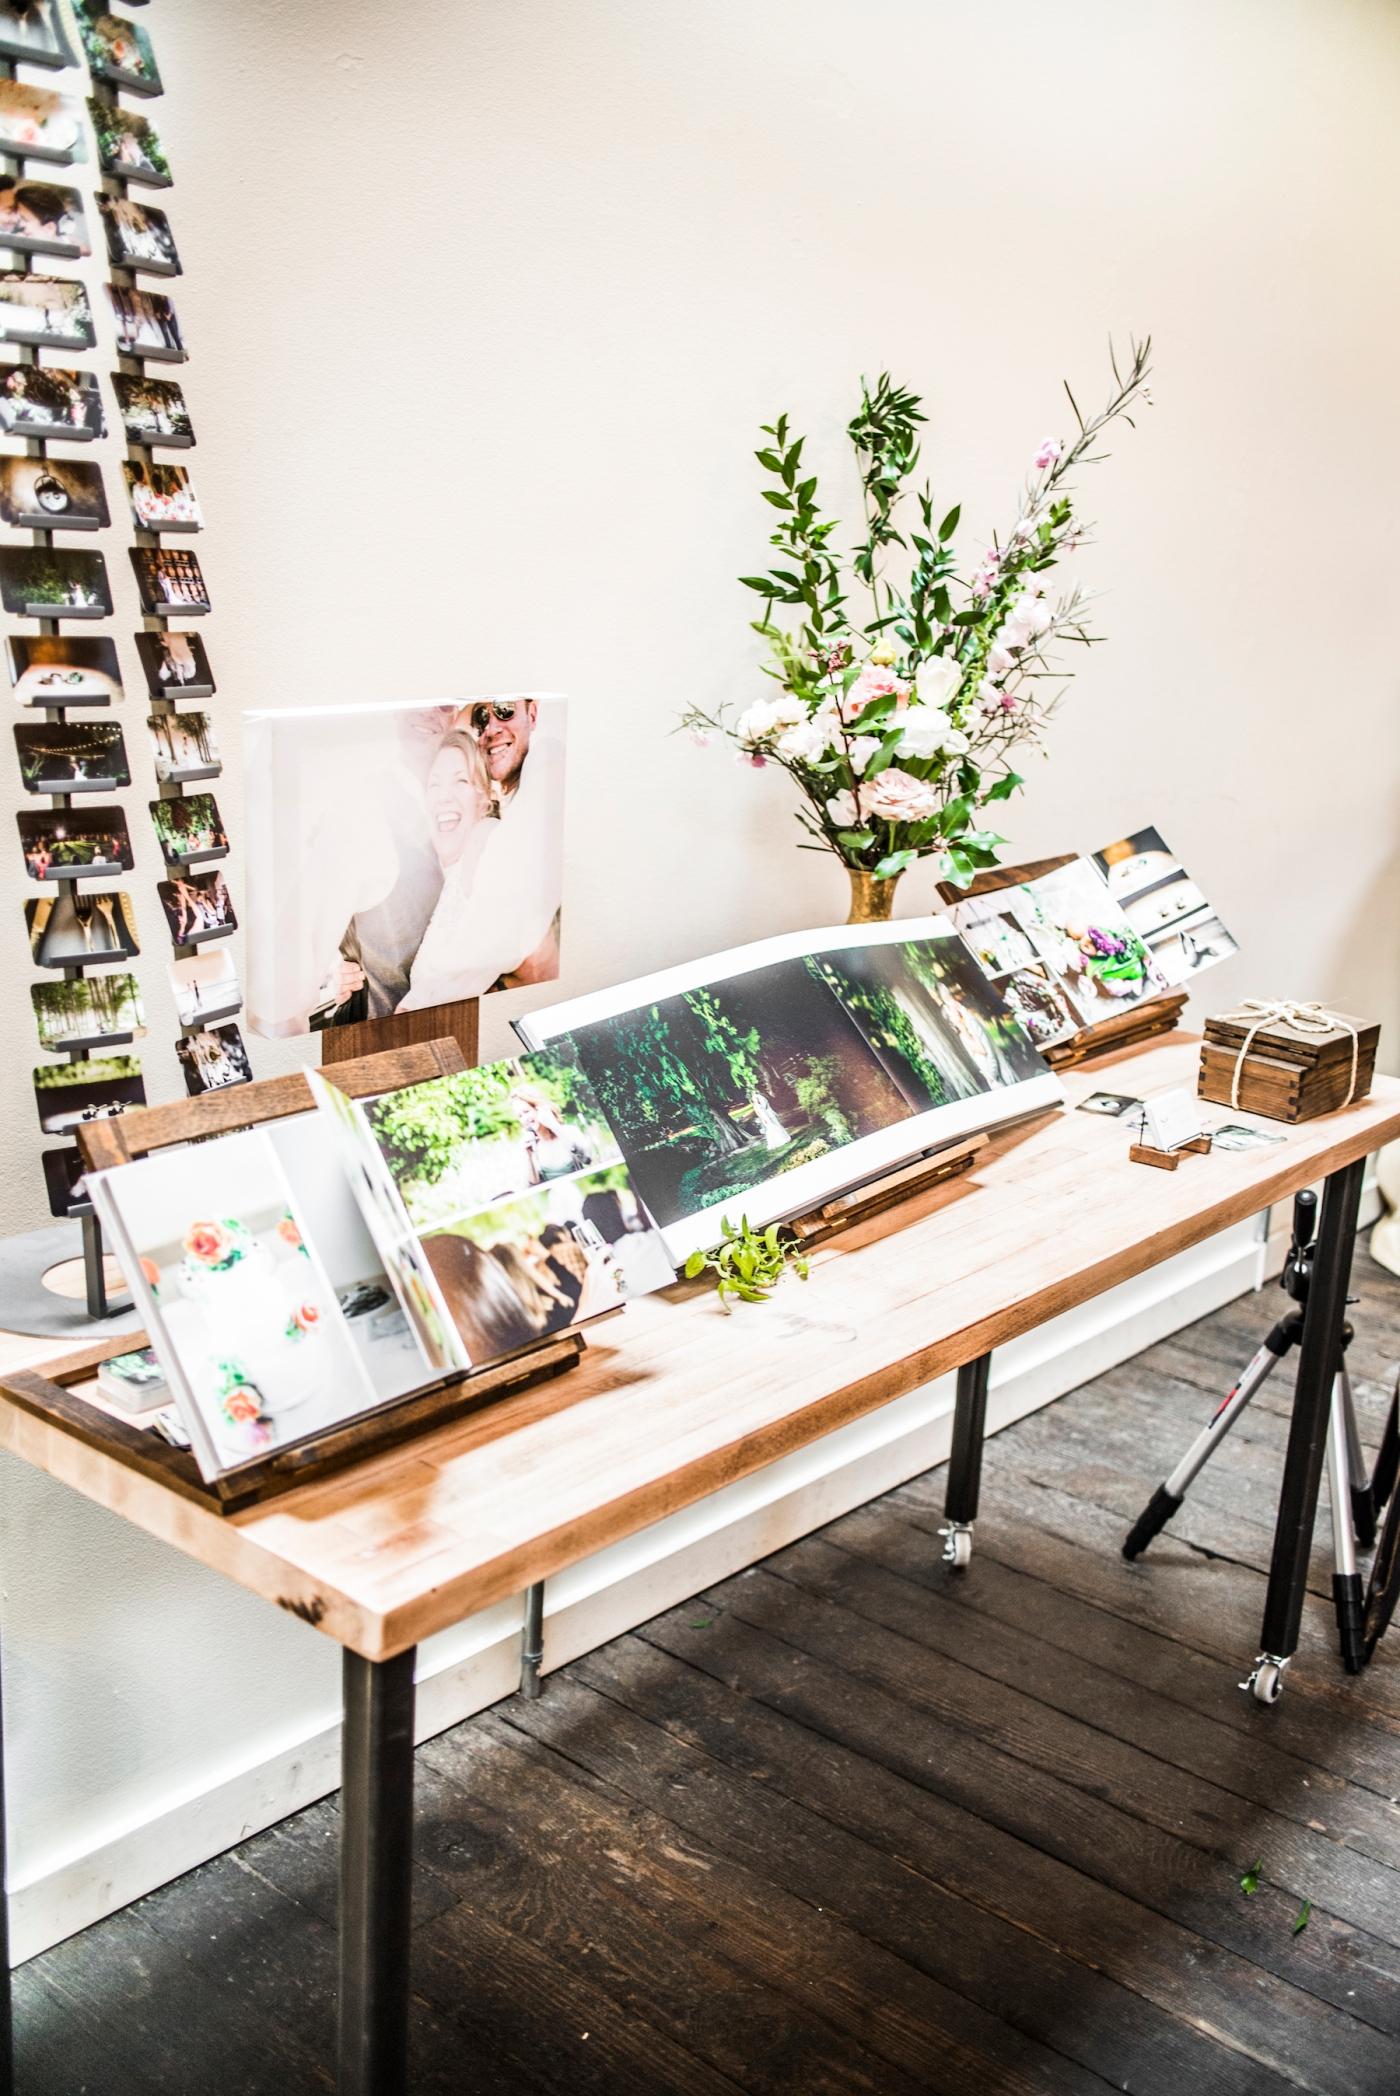 photography_by_jane_speleers_2017_wedding_show_i_do_sodo_within_designed_by_melody_davisdsc_0515